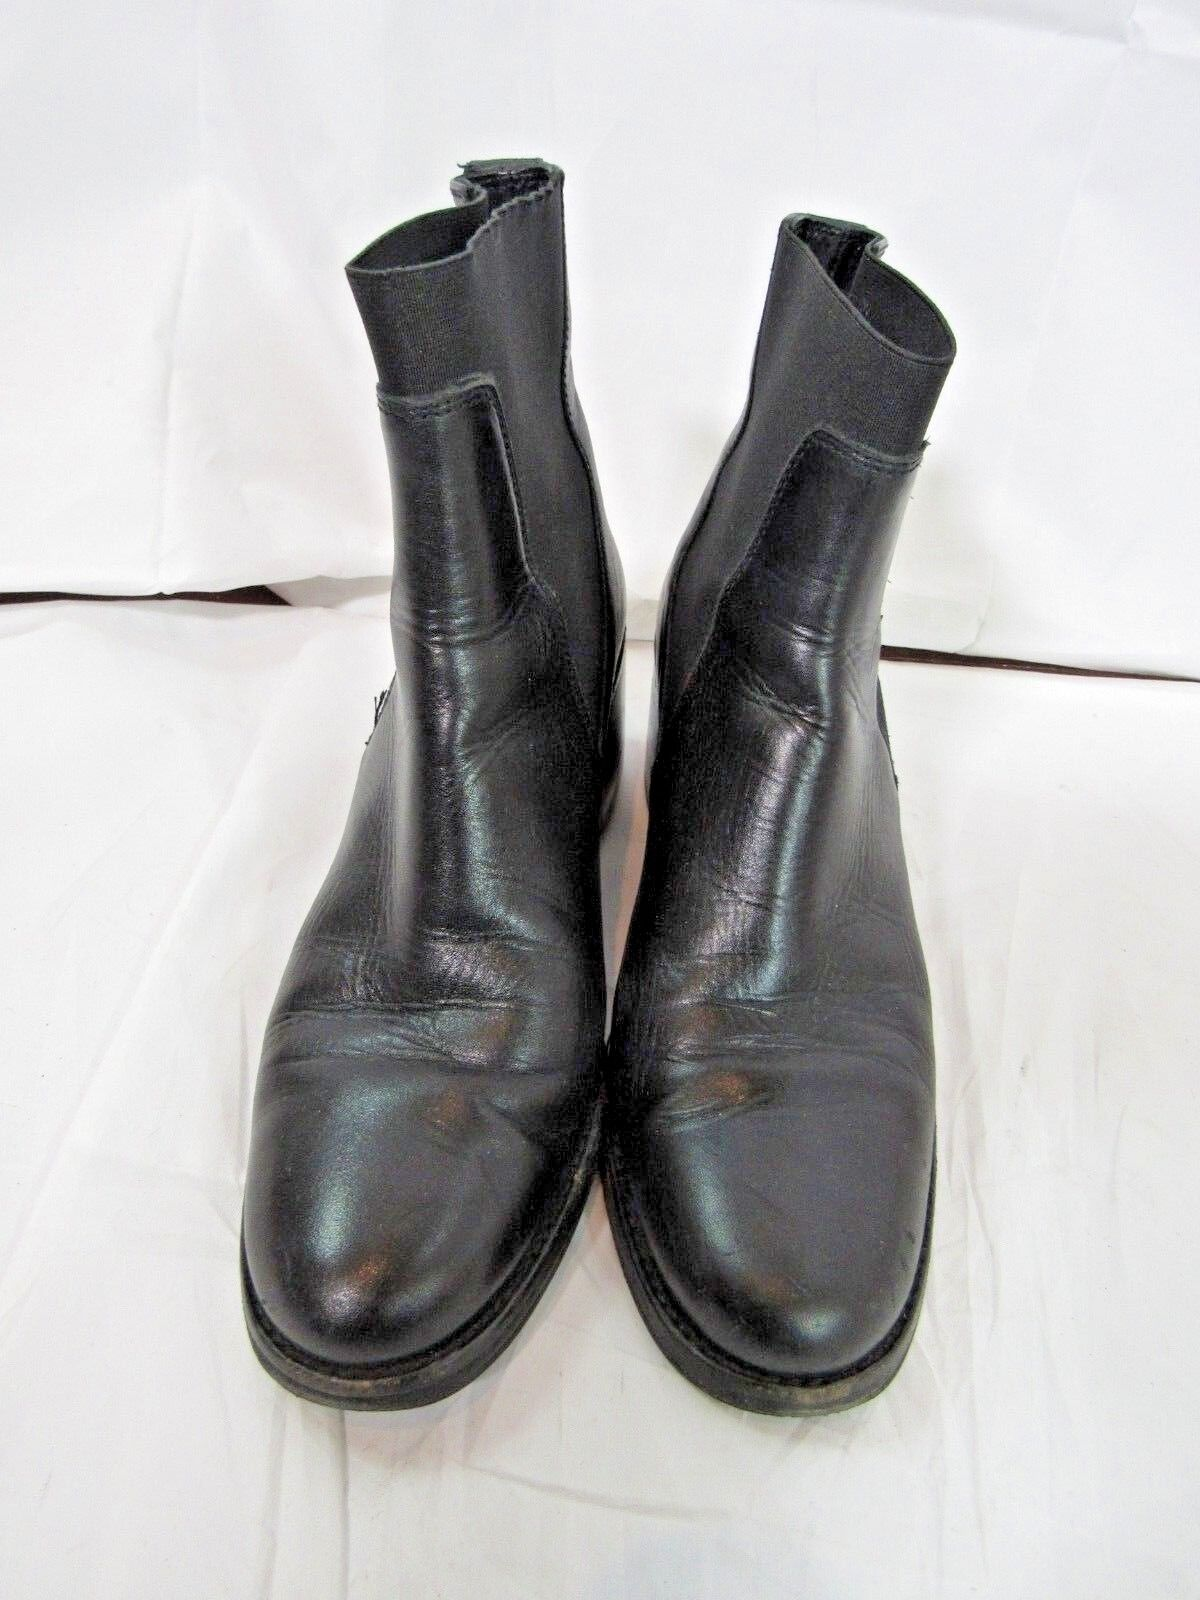 Delman Black Leather Block Heel Ankle Boot Size 6.5